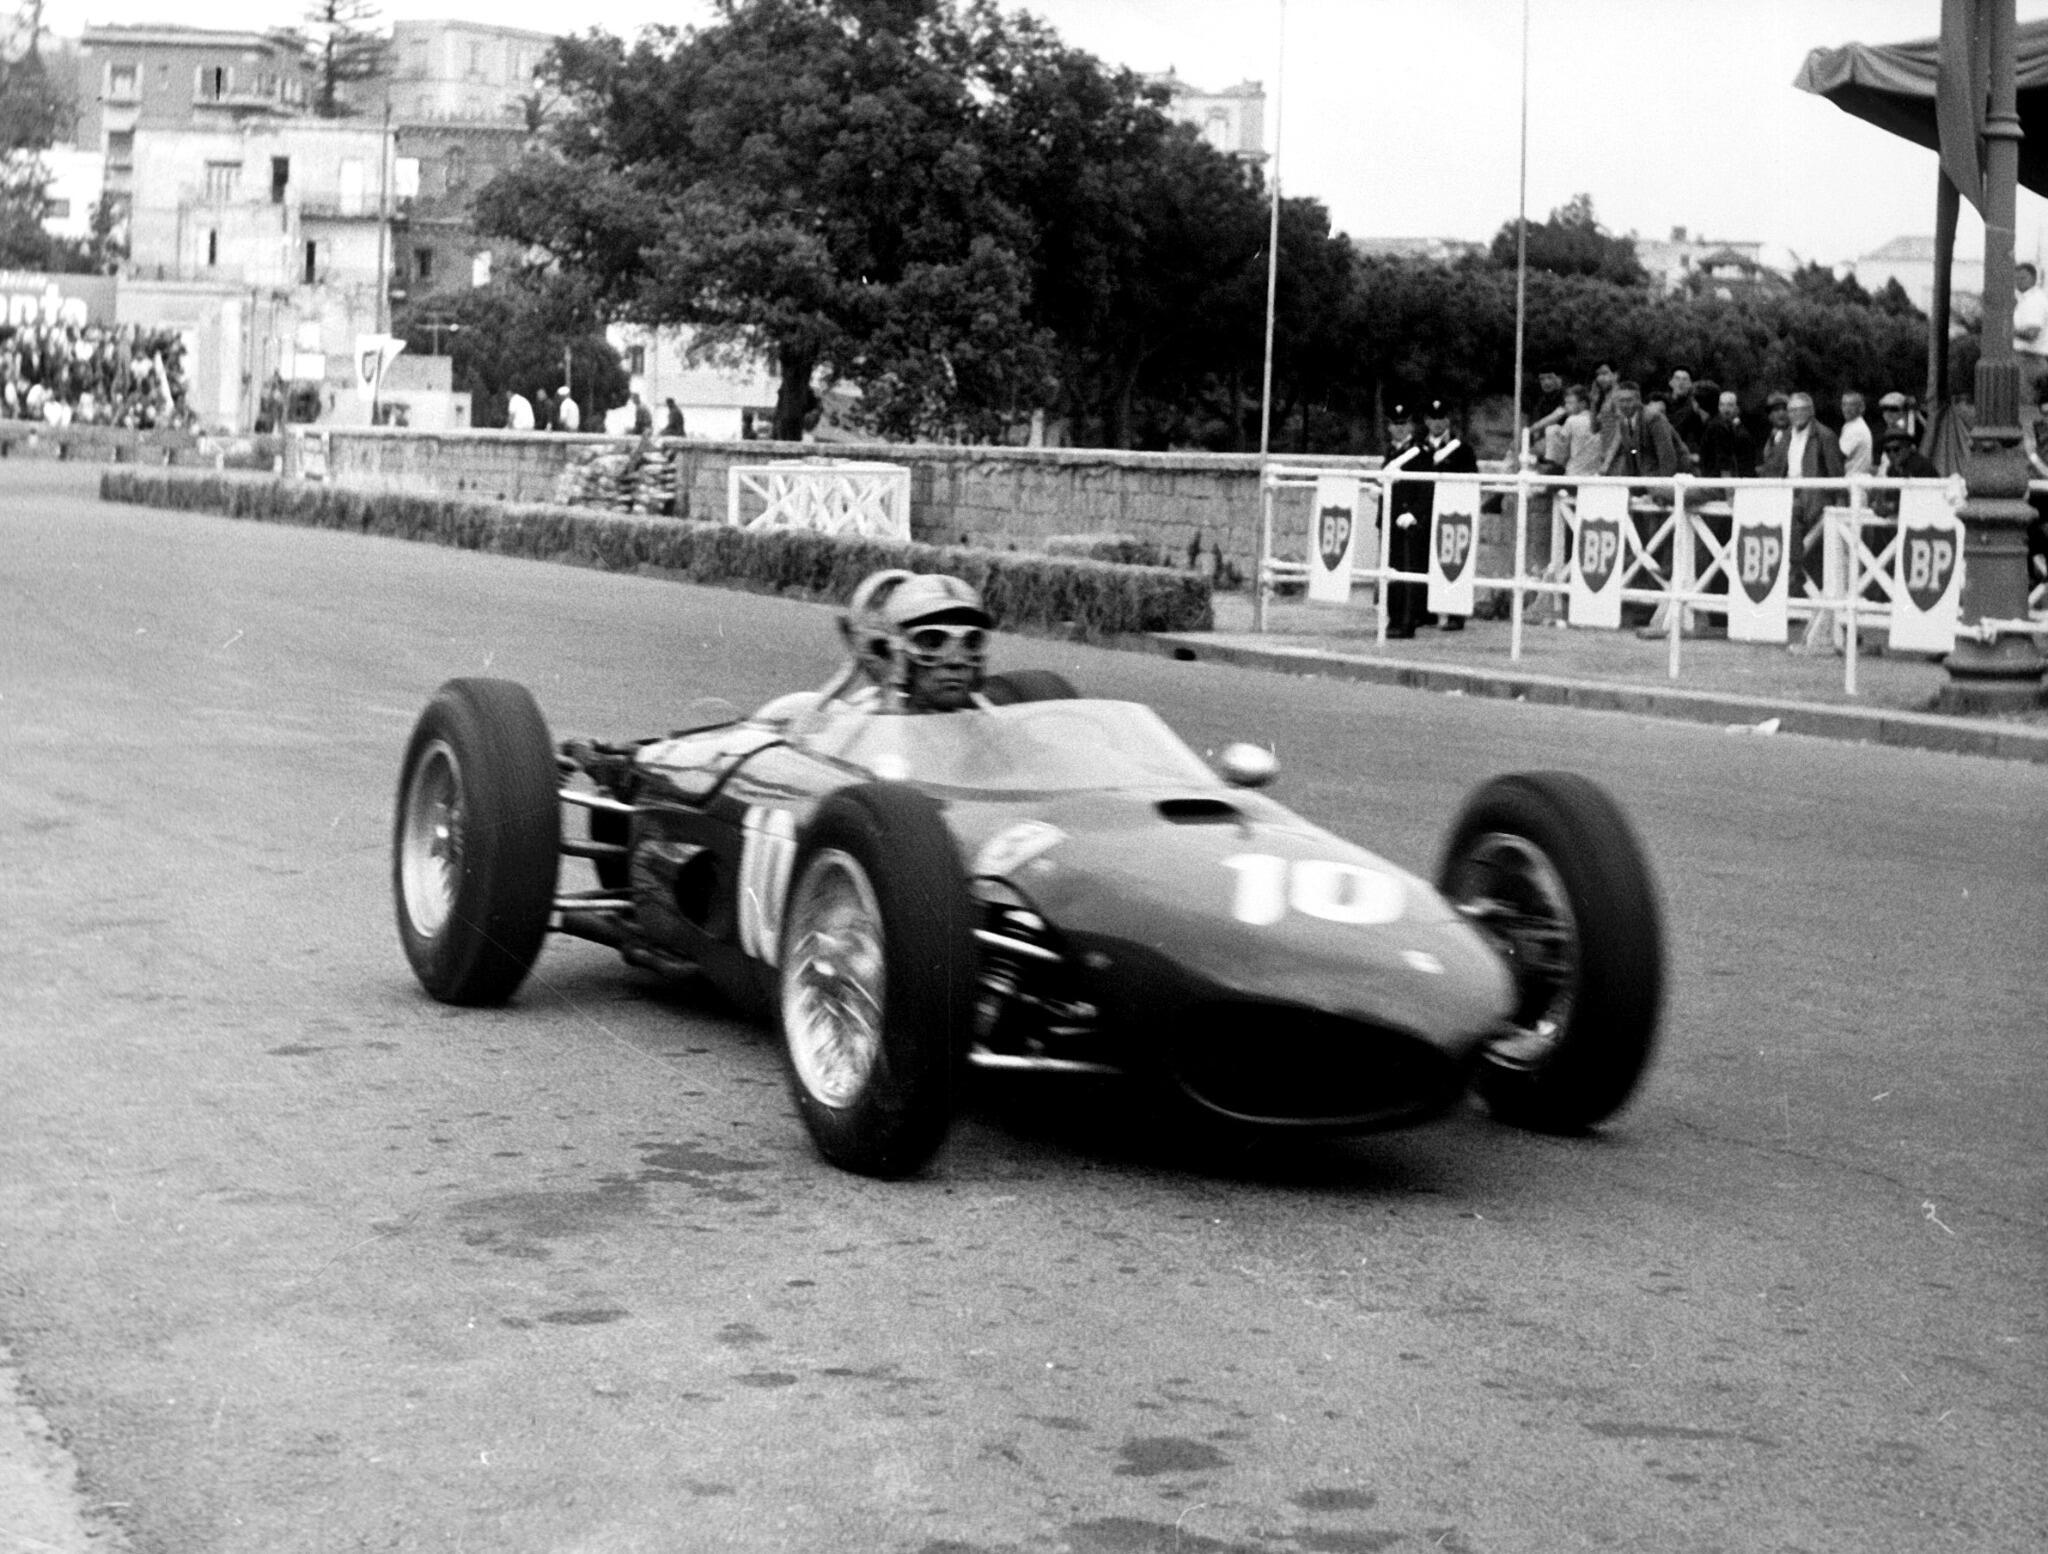 Willy Mairesse pilotuje své Ferrari v Neapoli roku 1962, foto: Scuderia Ferrari